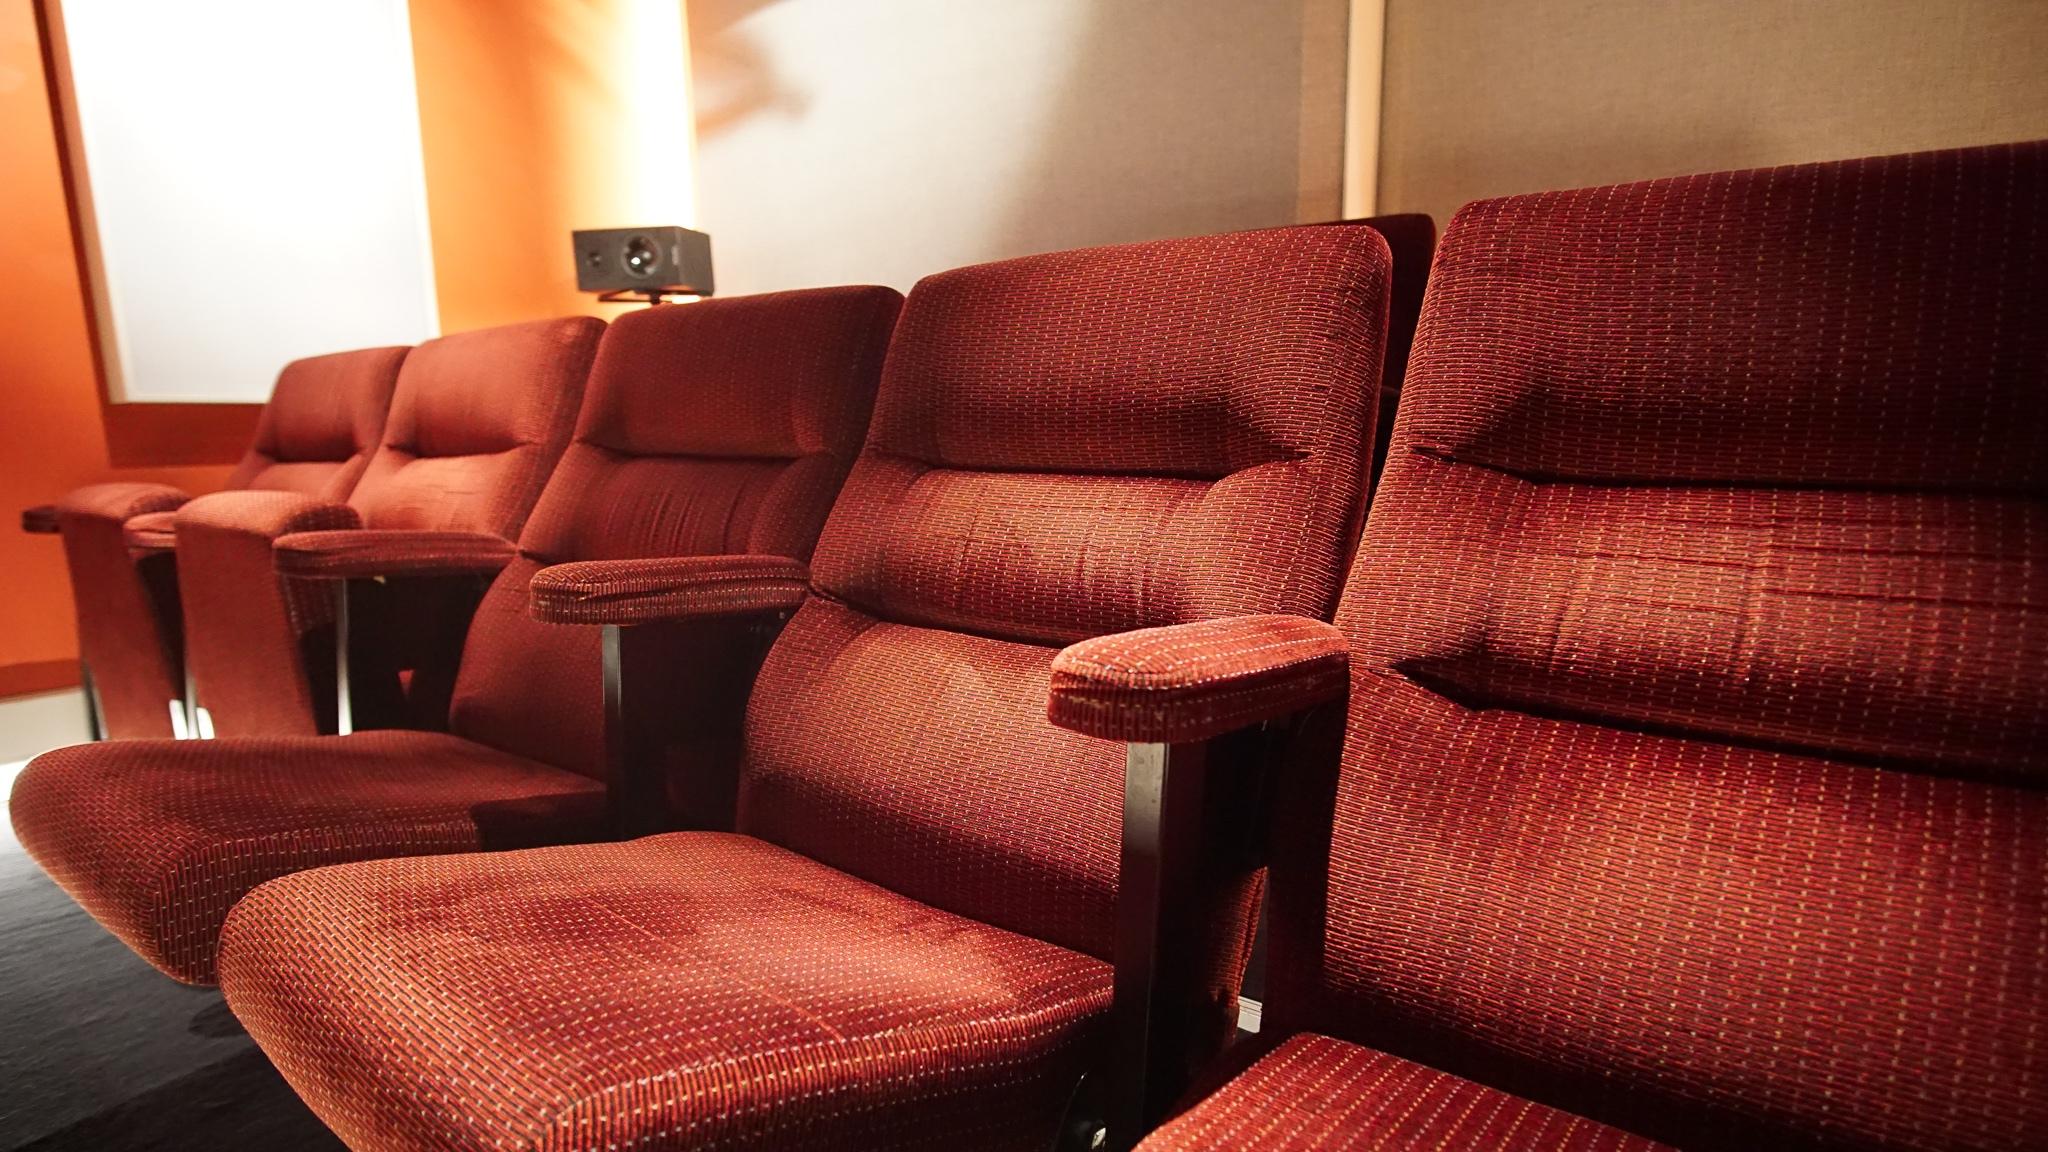 Kino_Sitze.jpg